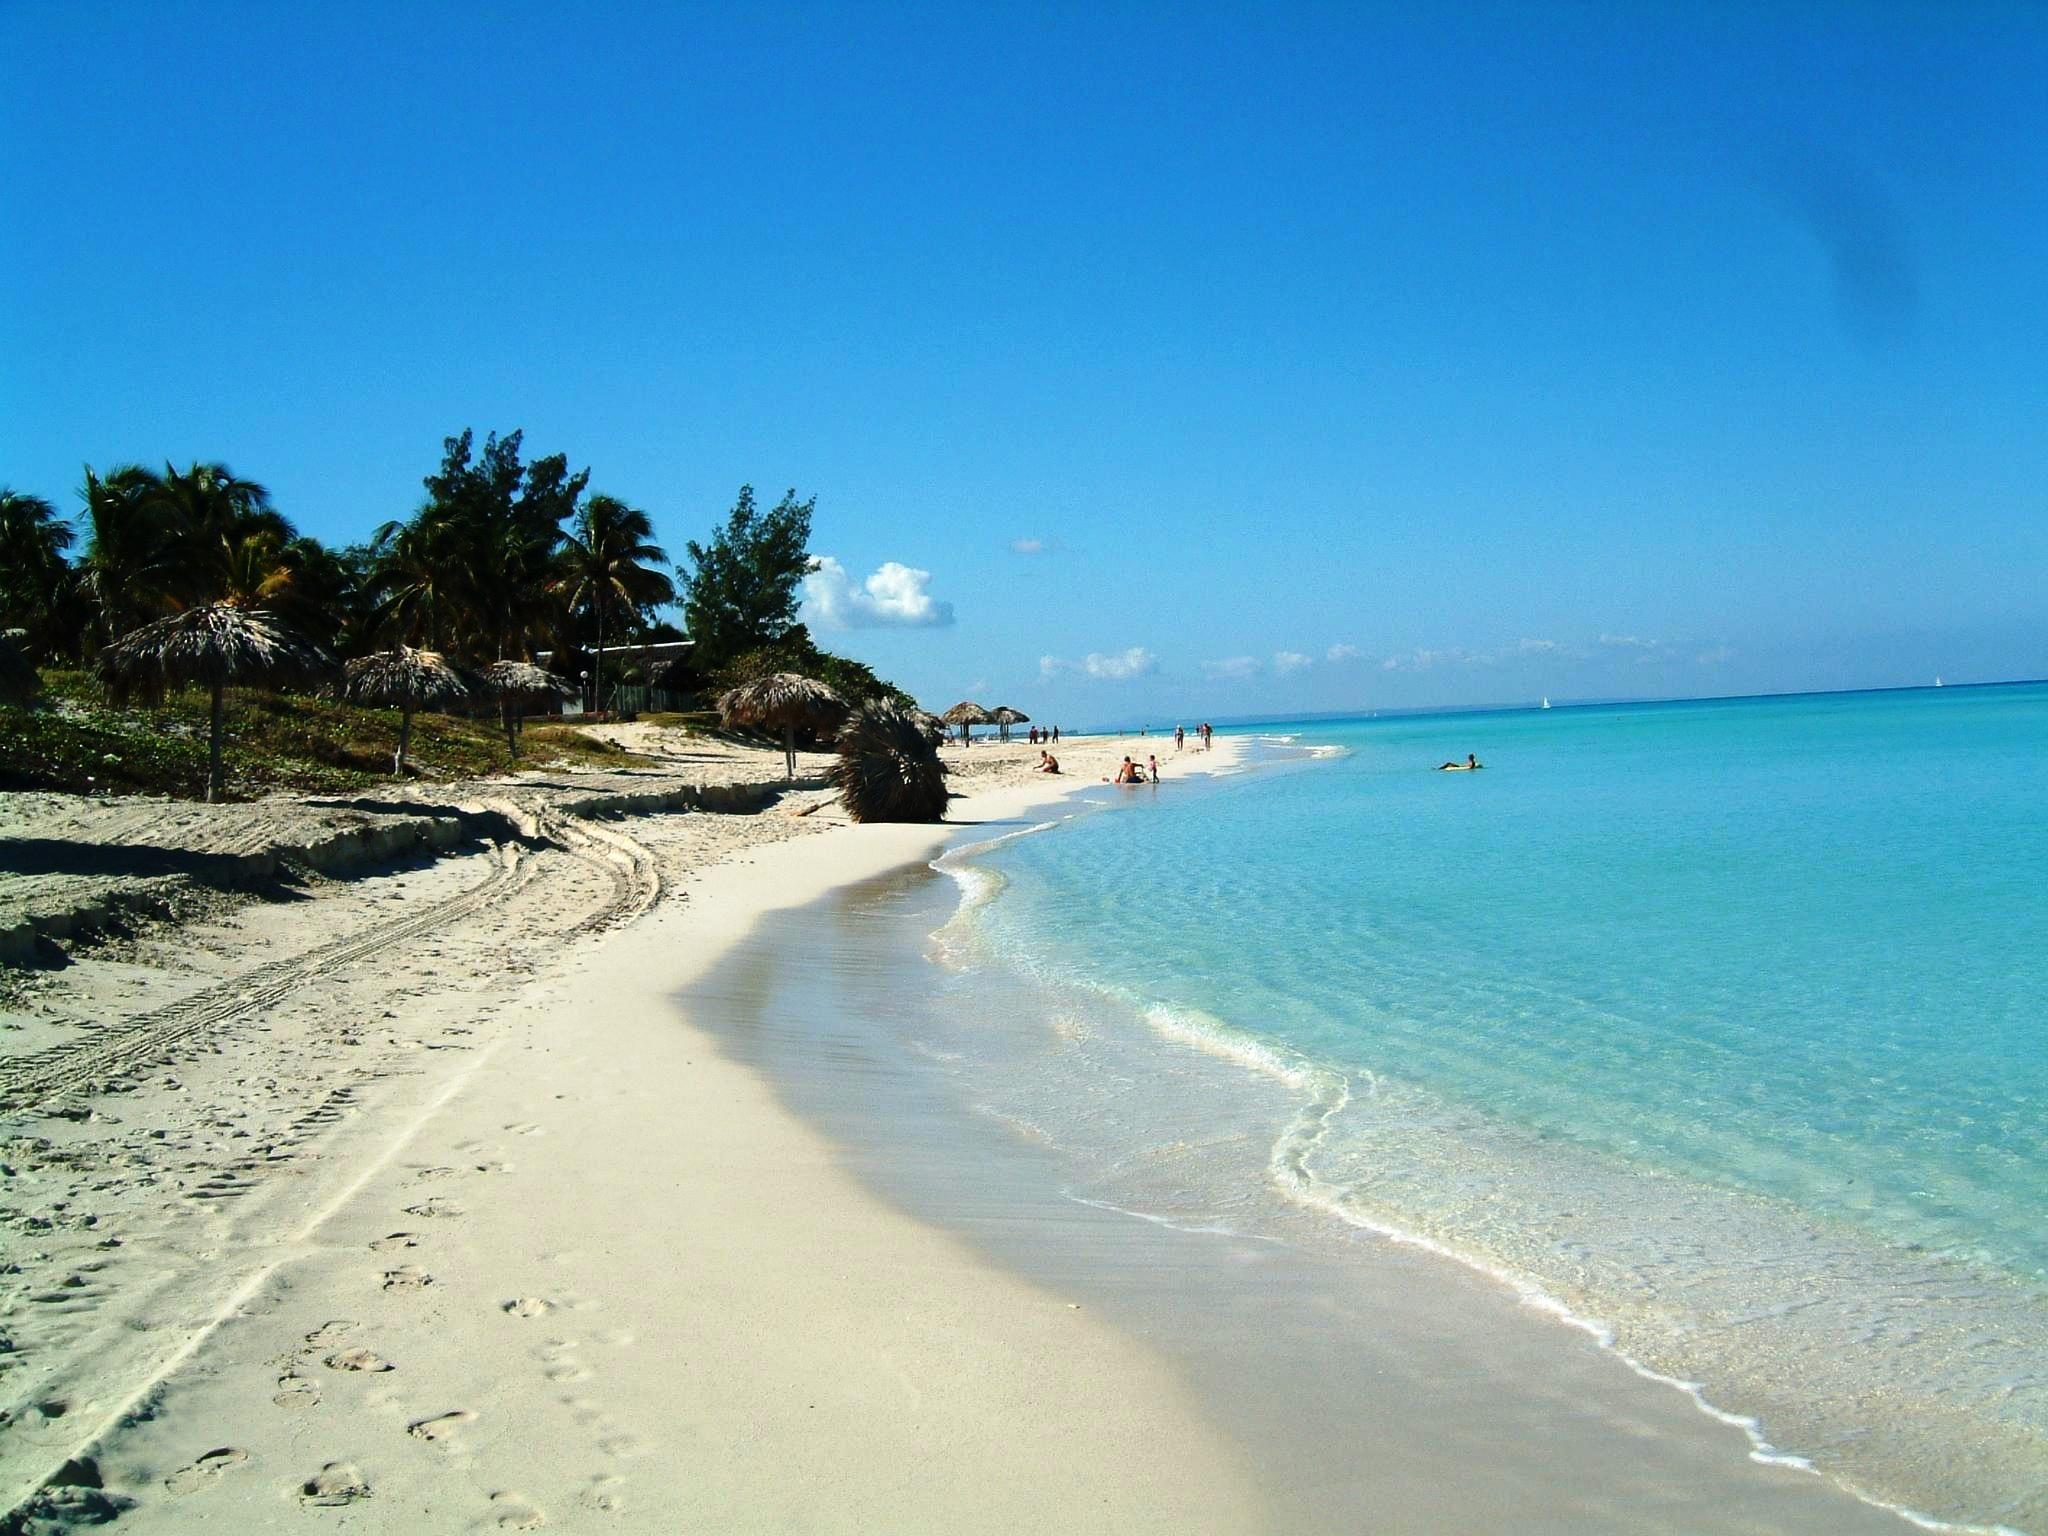 Playa Coral, Cuba